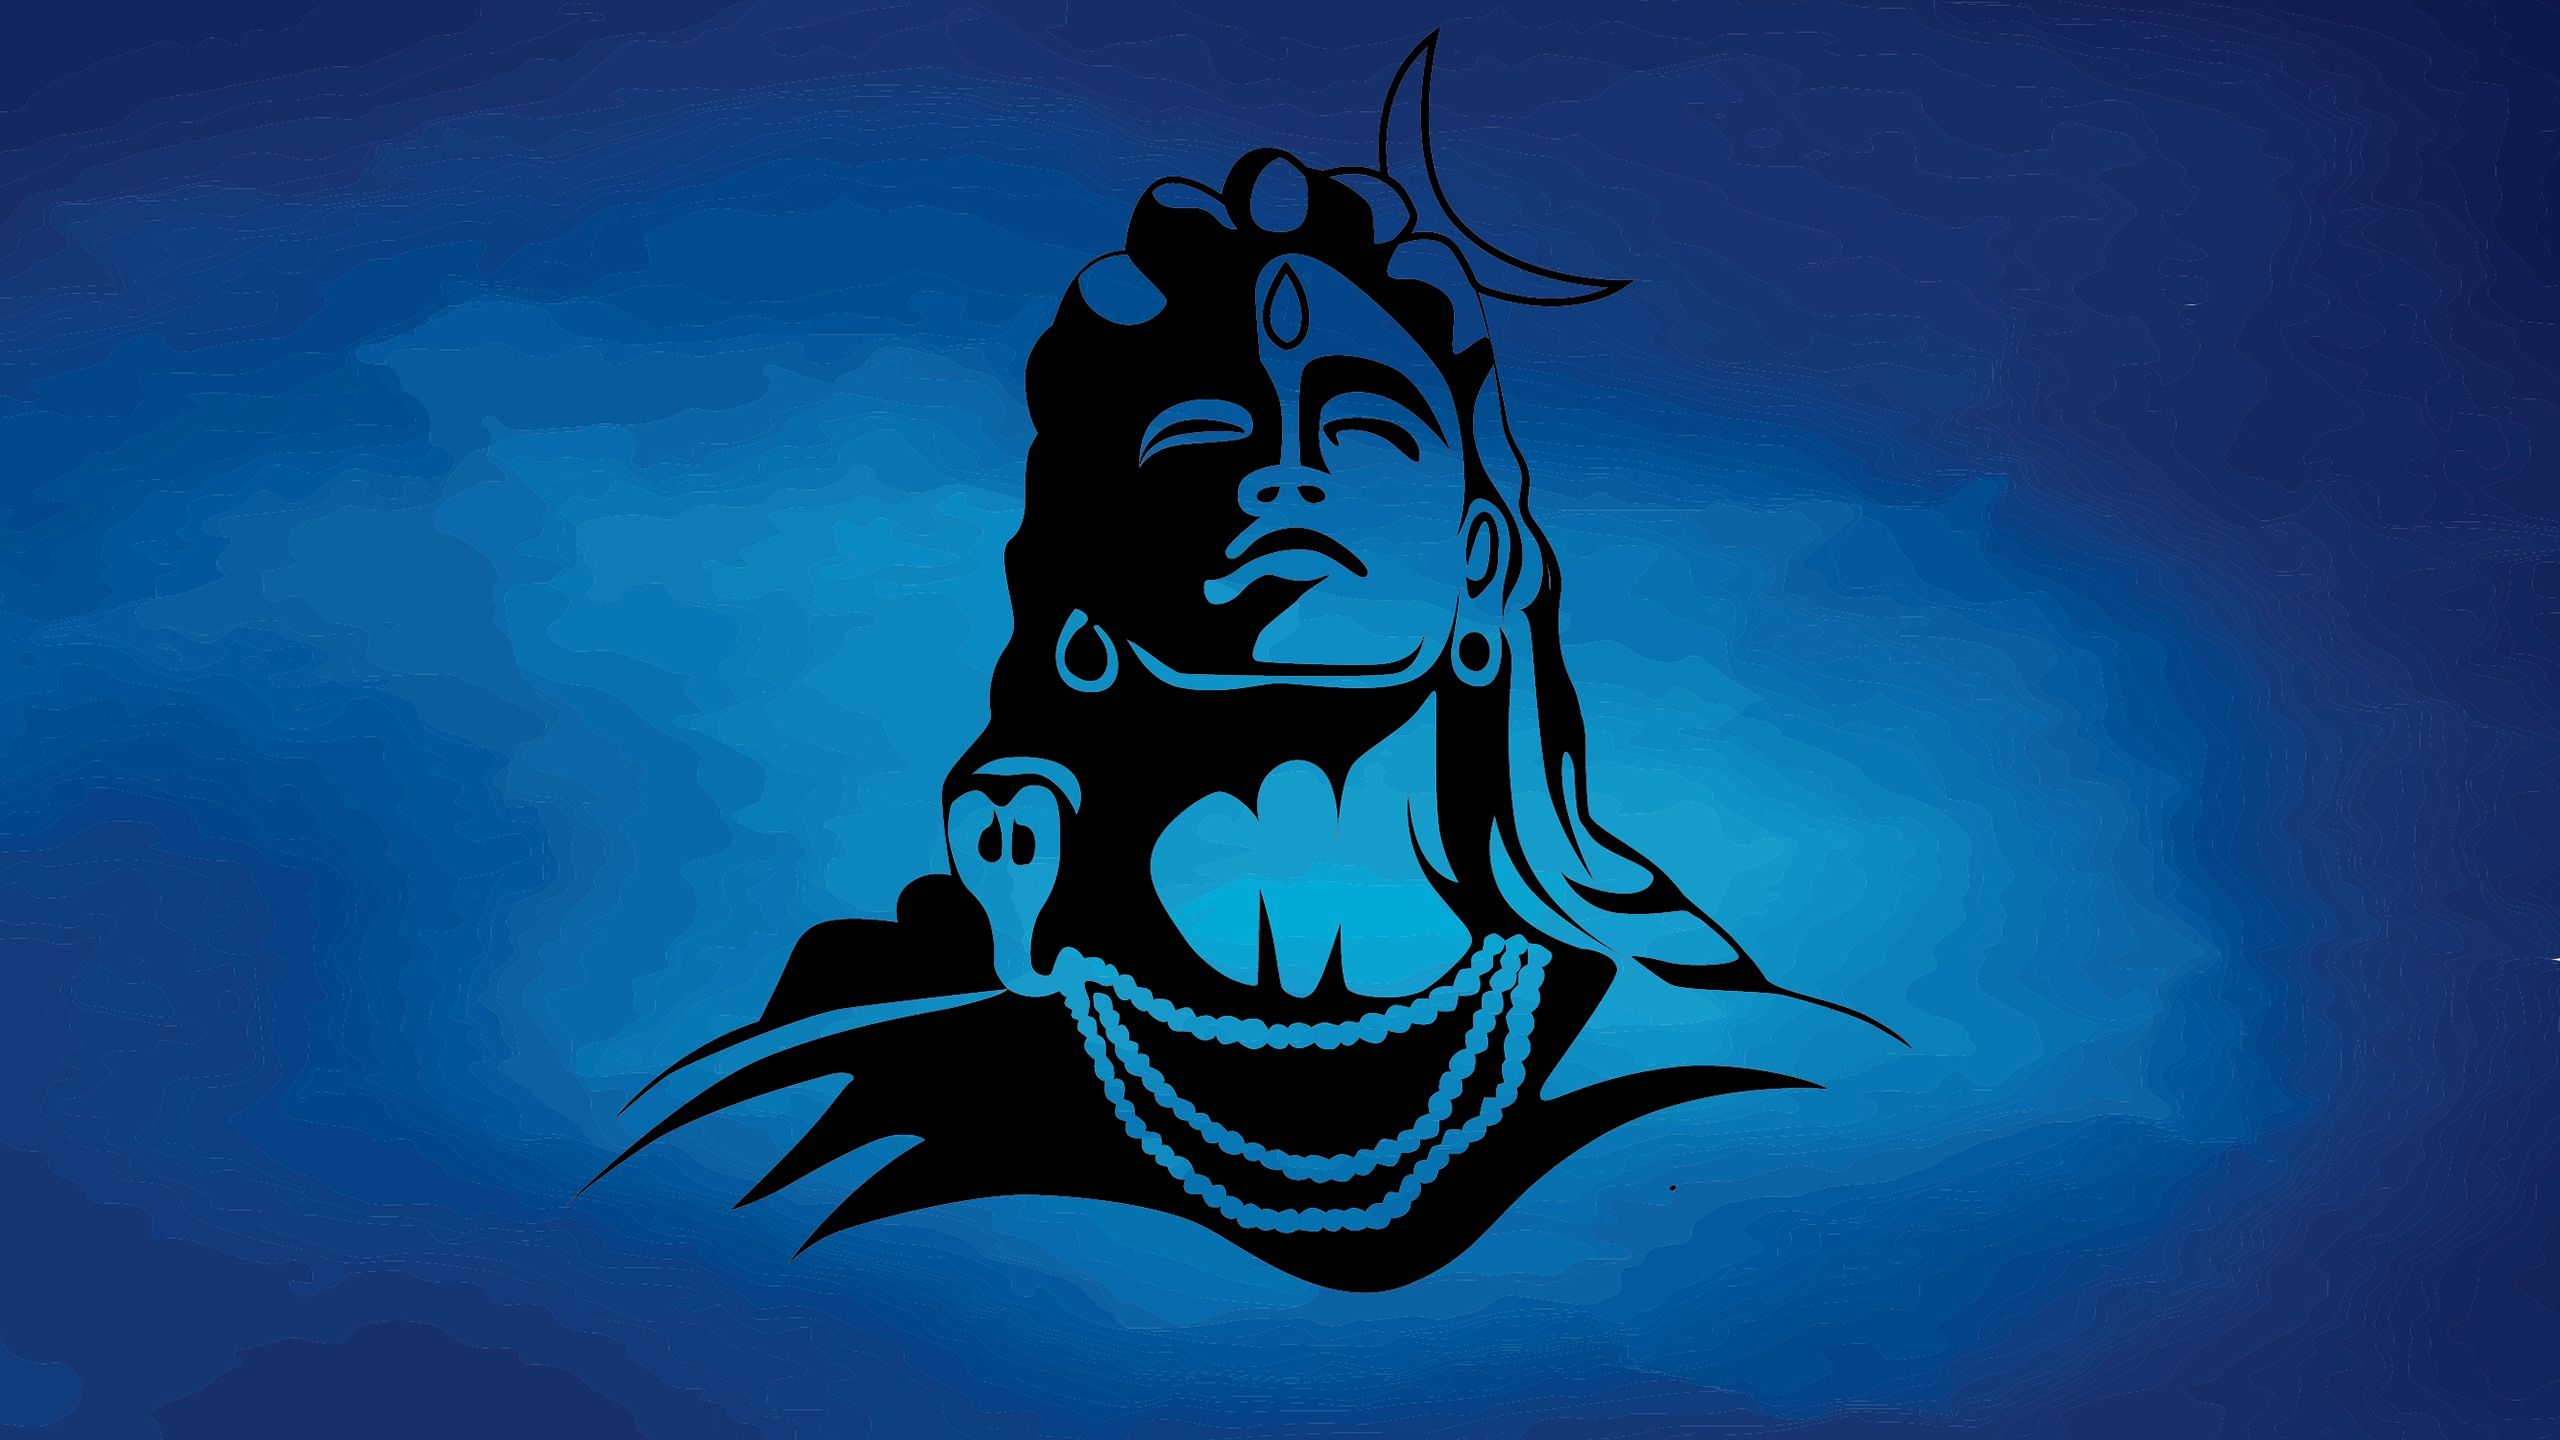 Pc Wallpaper 4k Lord Shiva Trick 4k Wallpapers For Pc Lord Shiva Hd Wallpaper Shiva Wallpaper